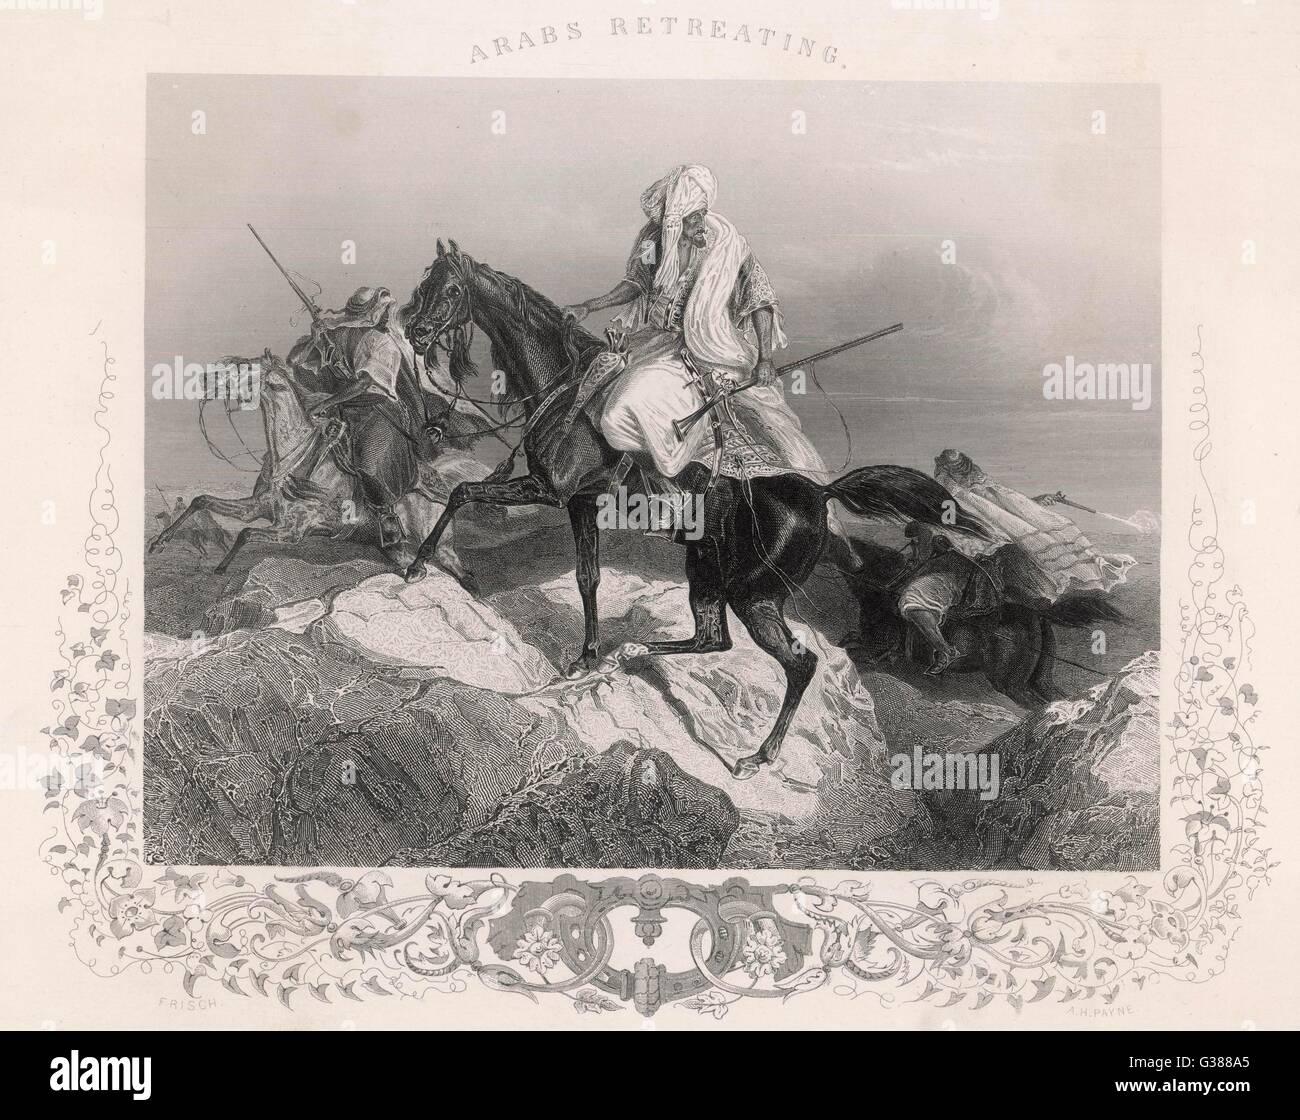 Araber Rückzug aus einem Konflikt Datum: Ende des 19. Jahrhunderts Stockbild